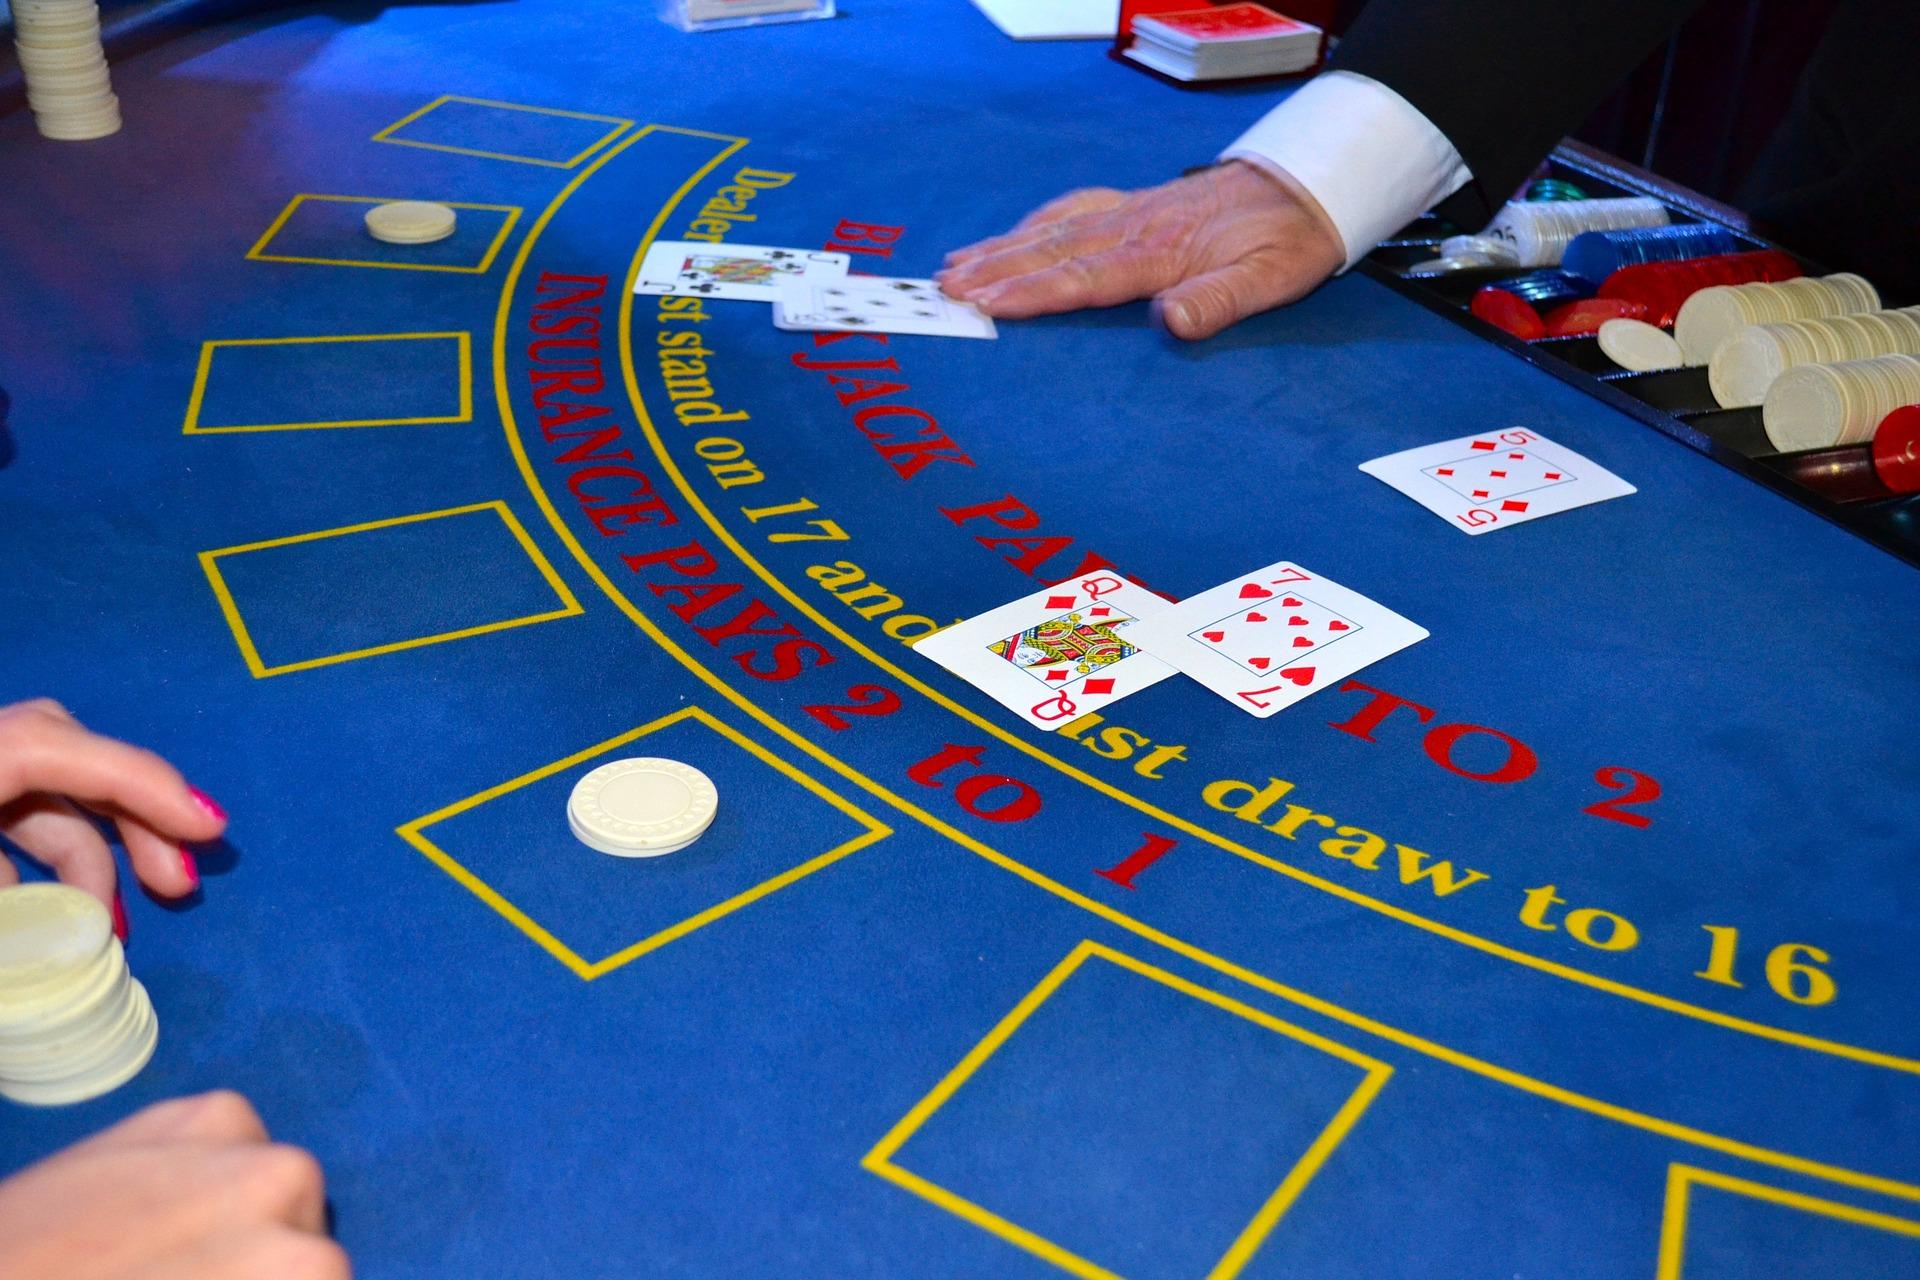 AGA survey finds improving American attitude towards gambling